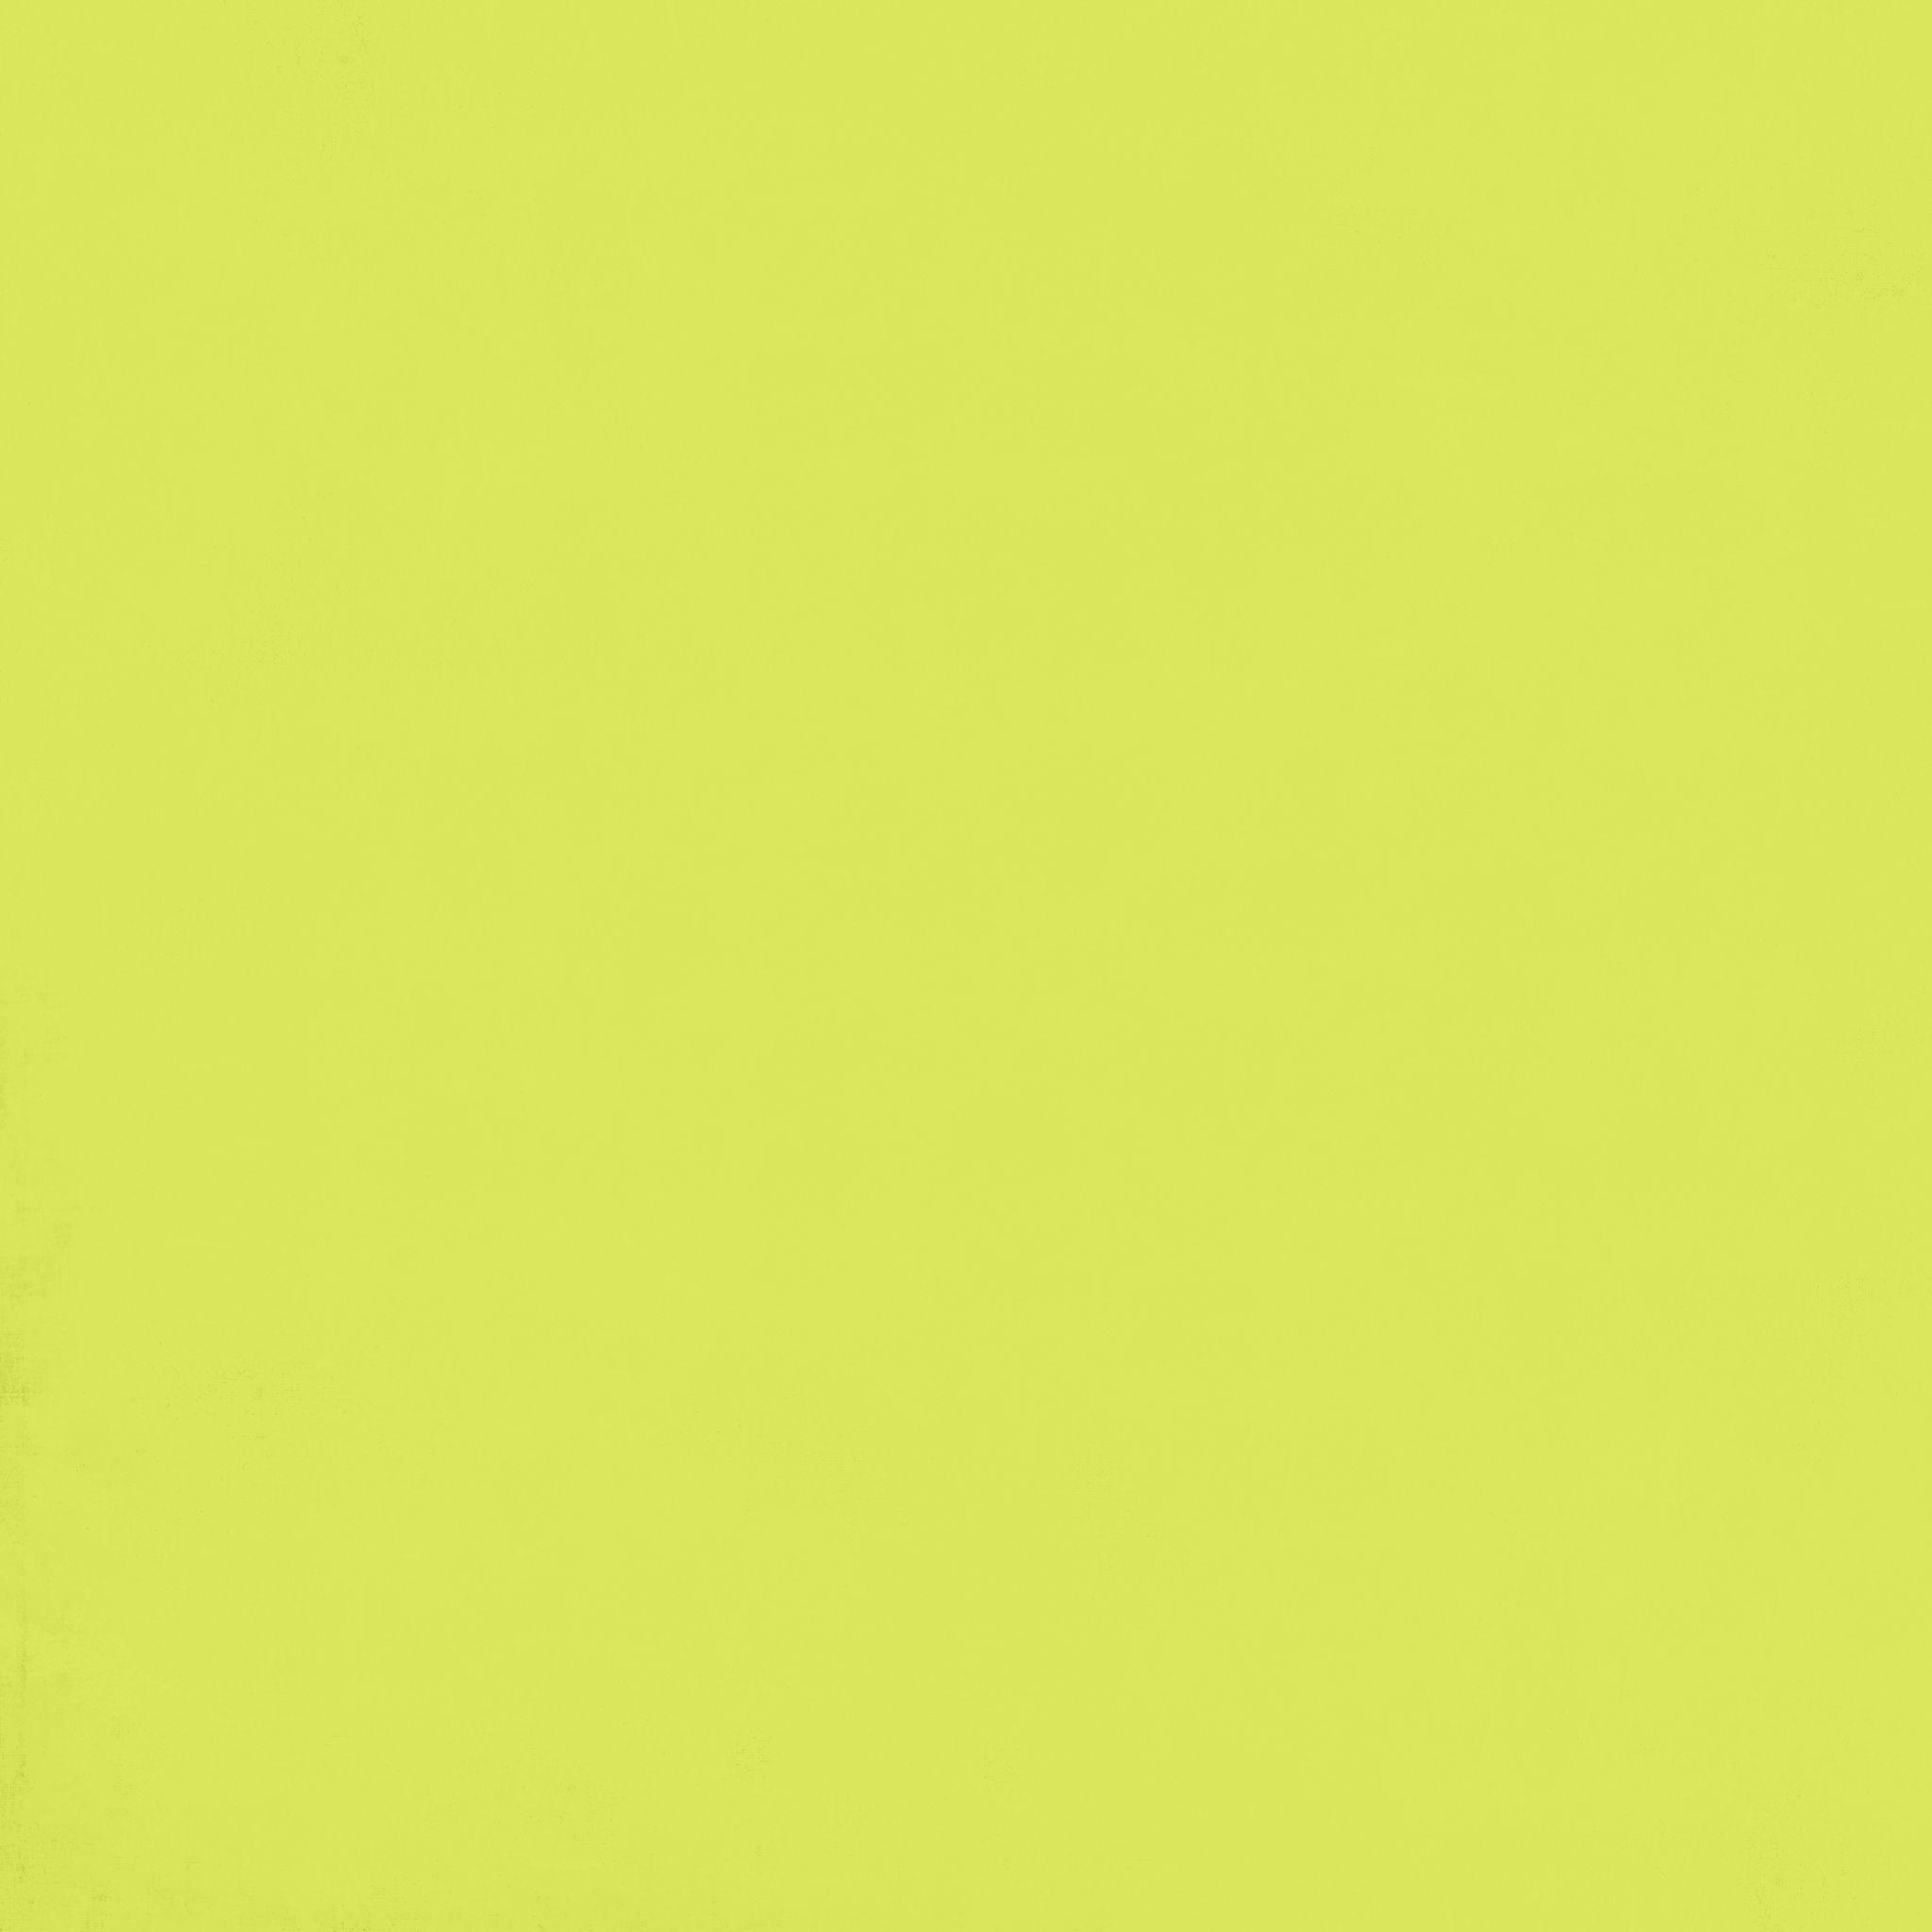 7 Lime Sfondi A Tinta Unita Colori E Giallo